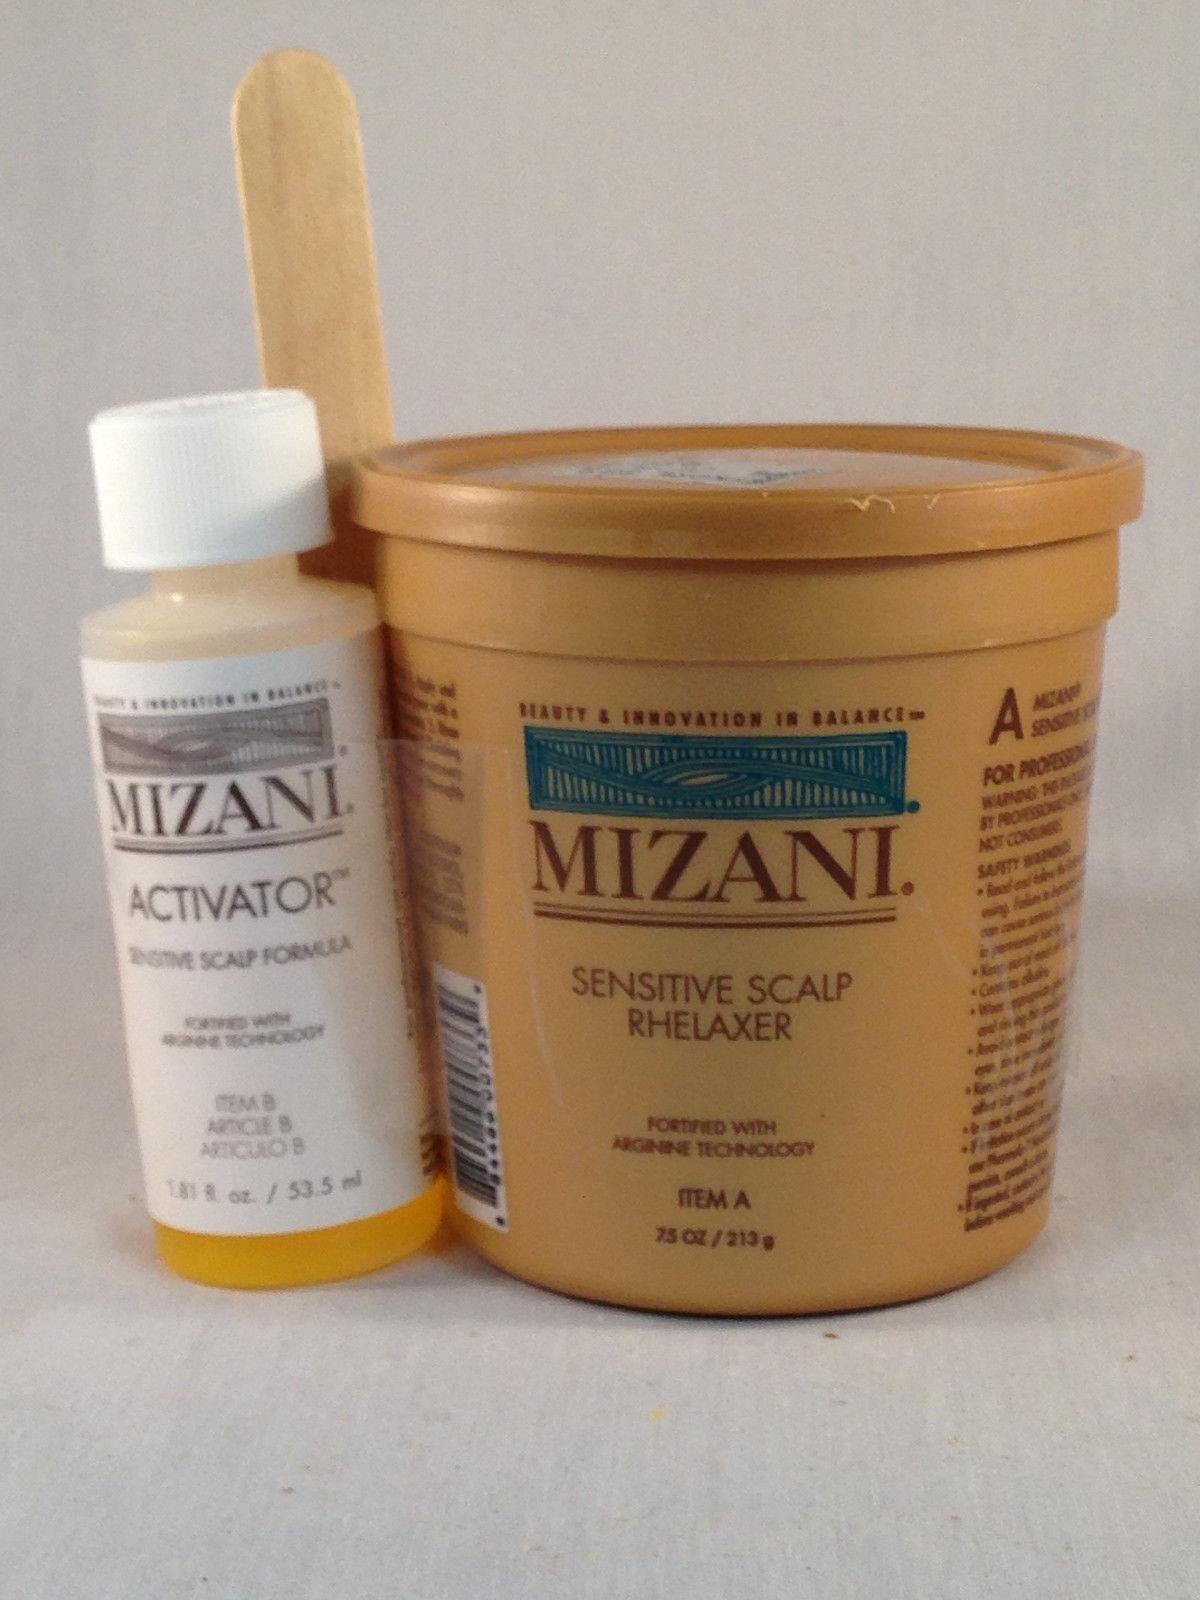 Mizani Sensitive Scalp Relaxer Single Application Kit Hair Care & Styling